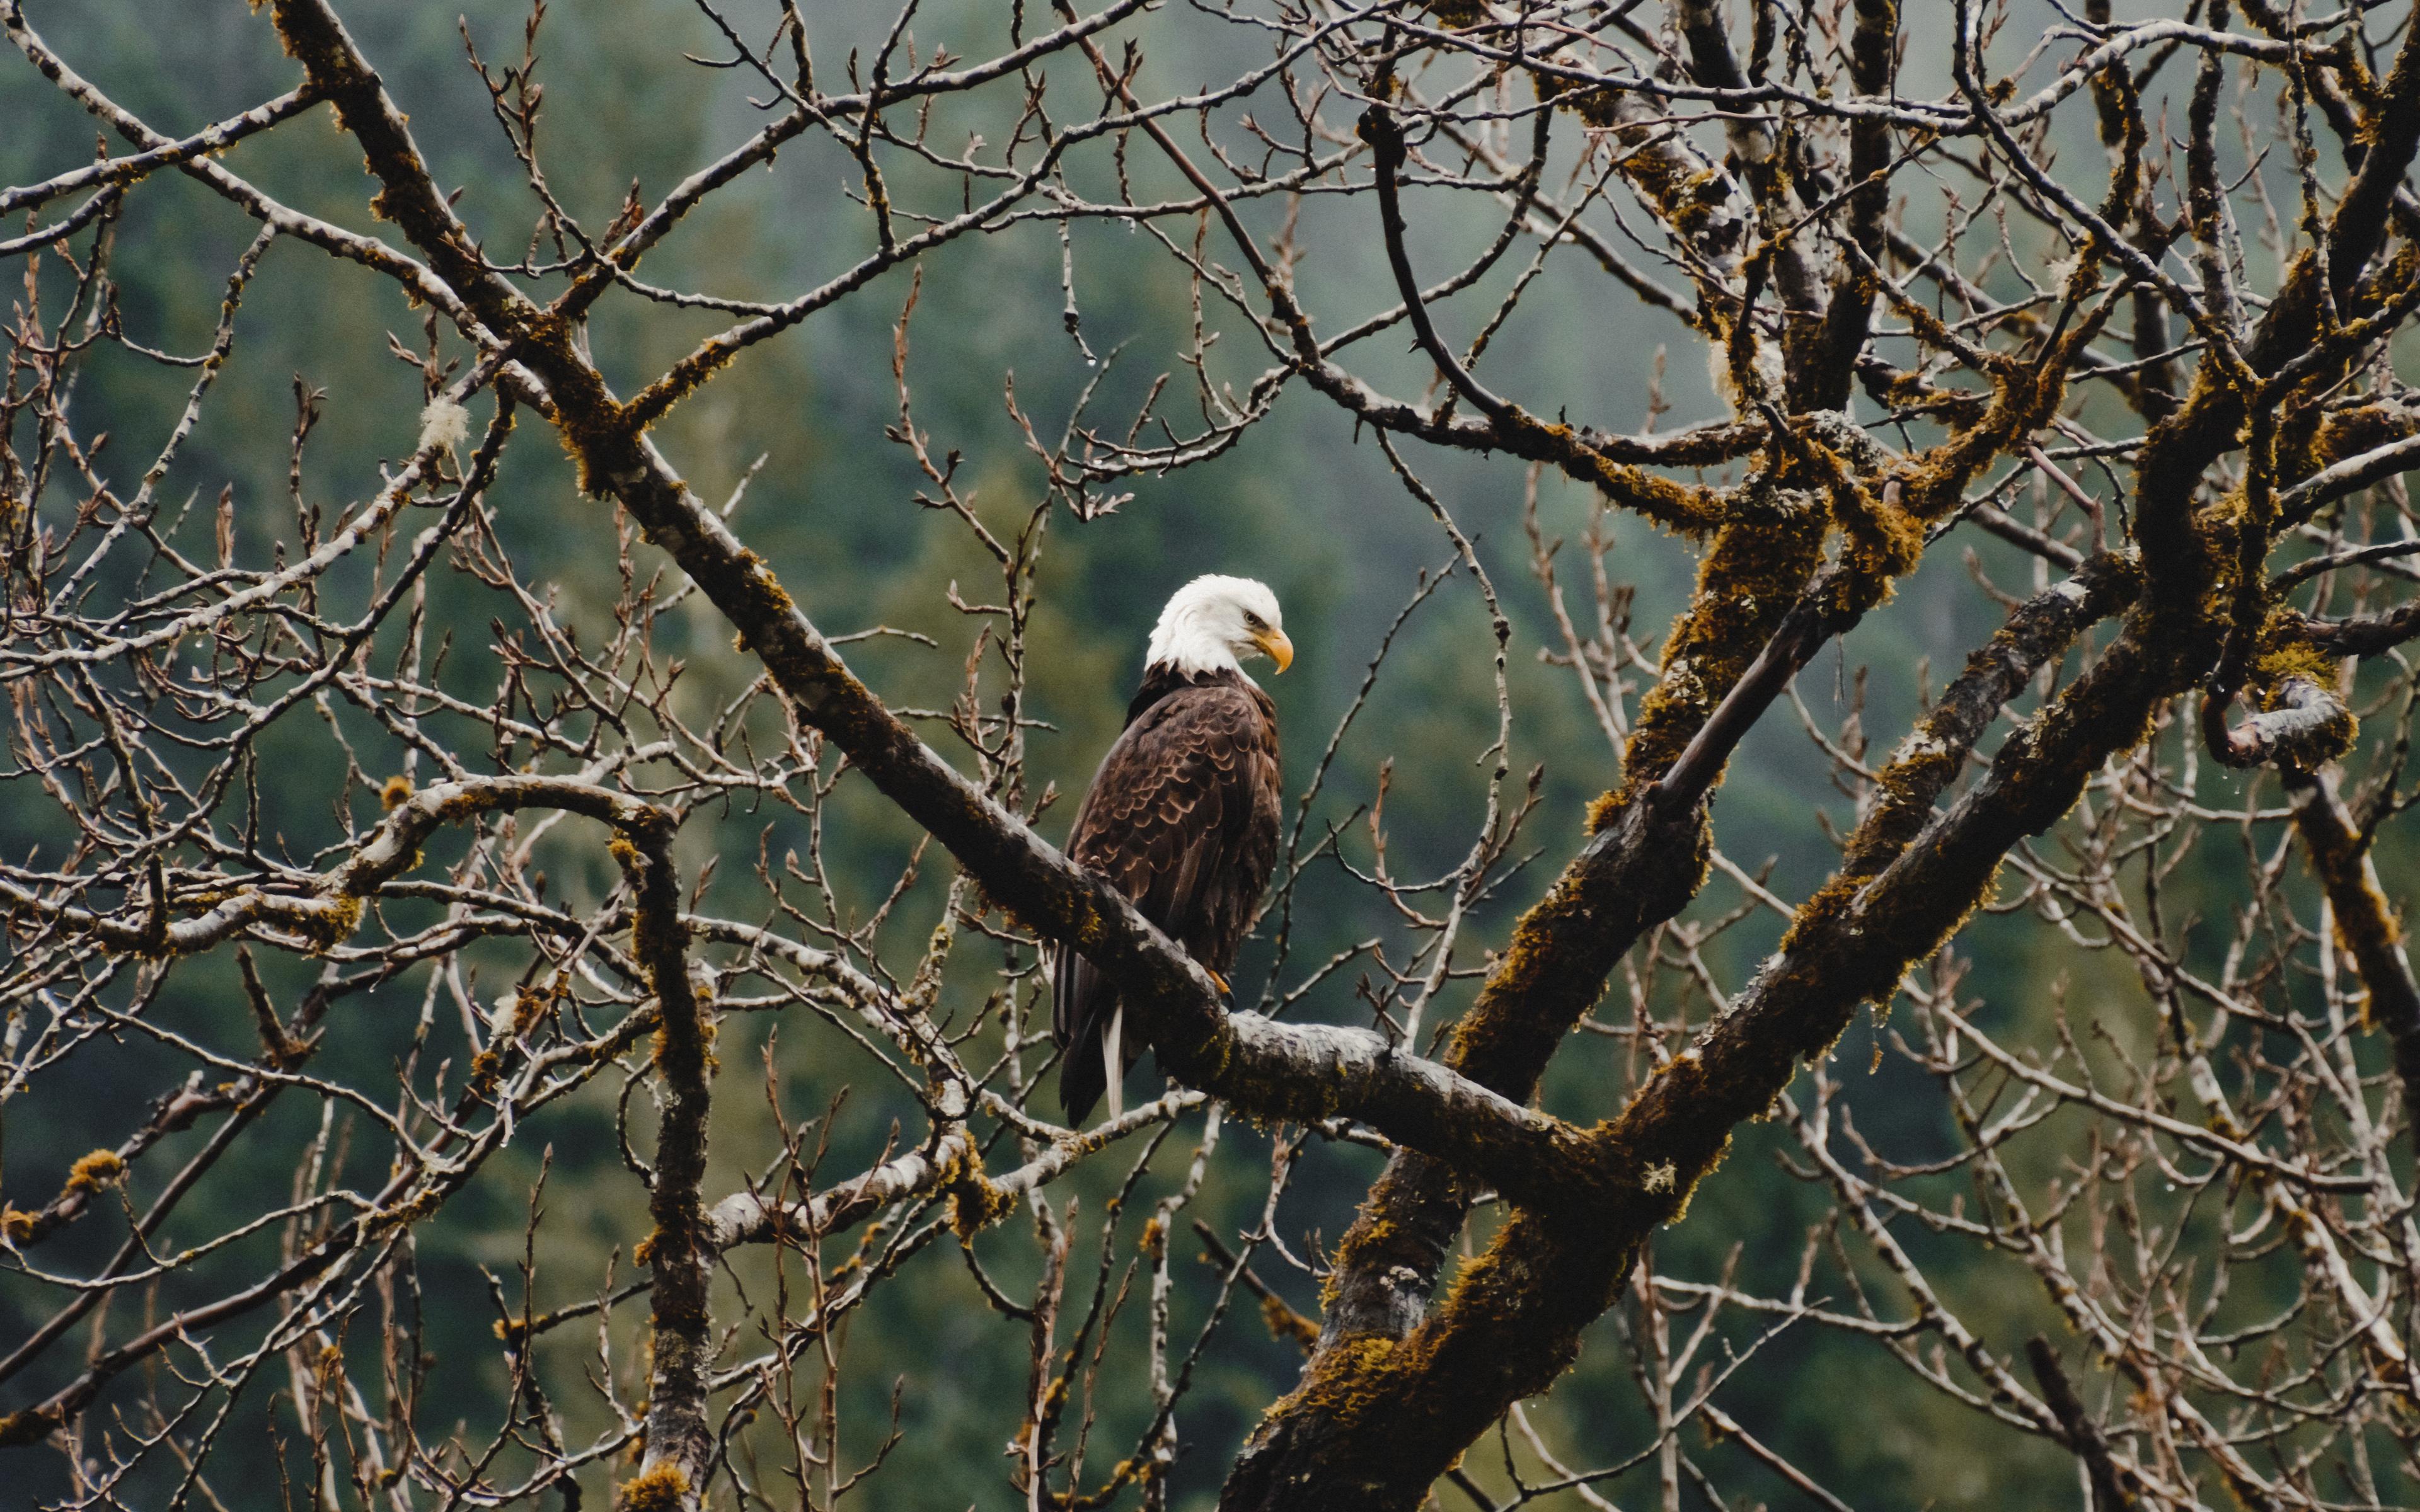 bald-eagle-sitting-on-branch-4k-e8.jpg